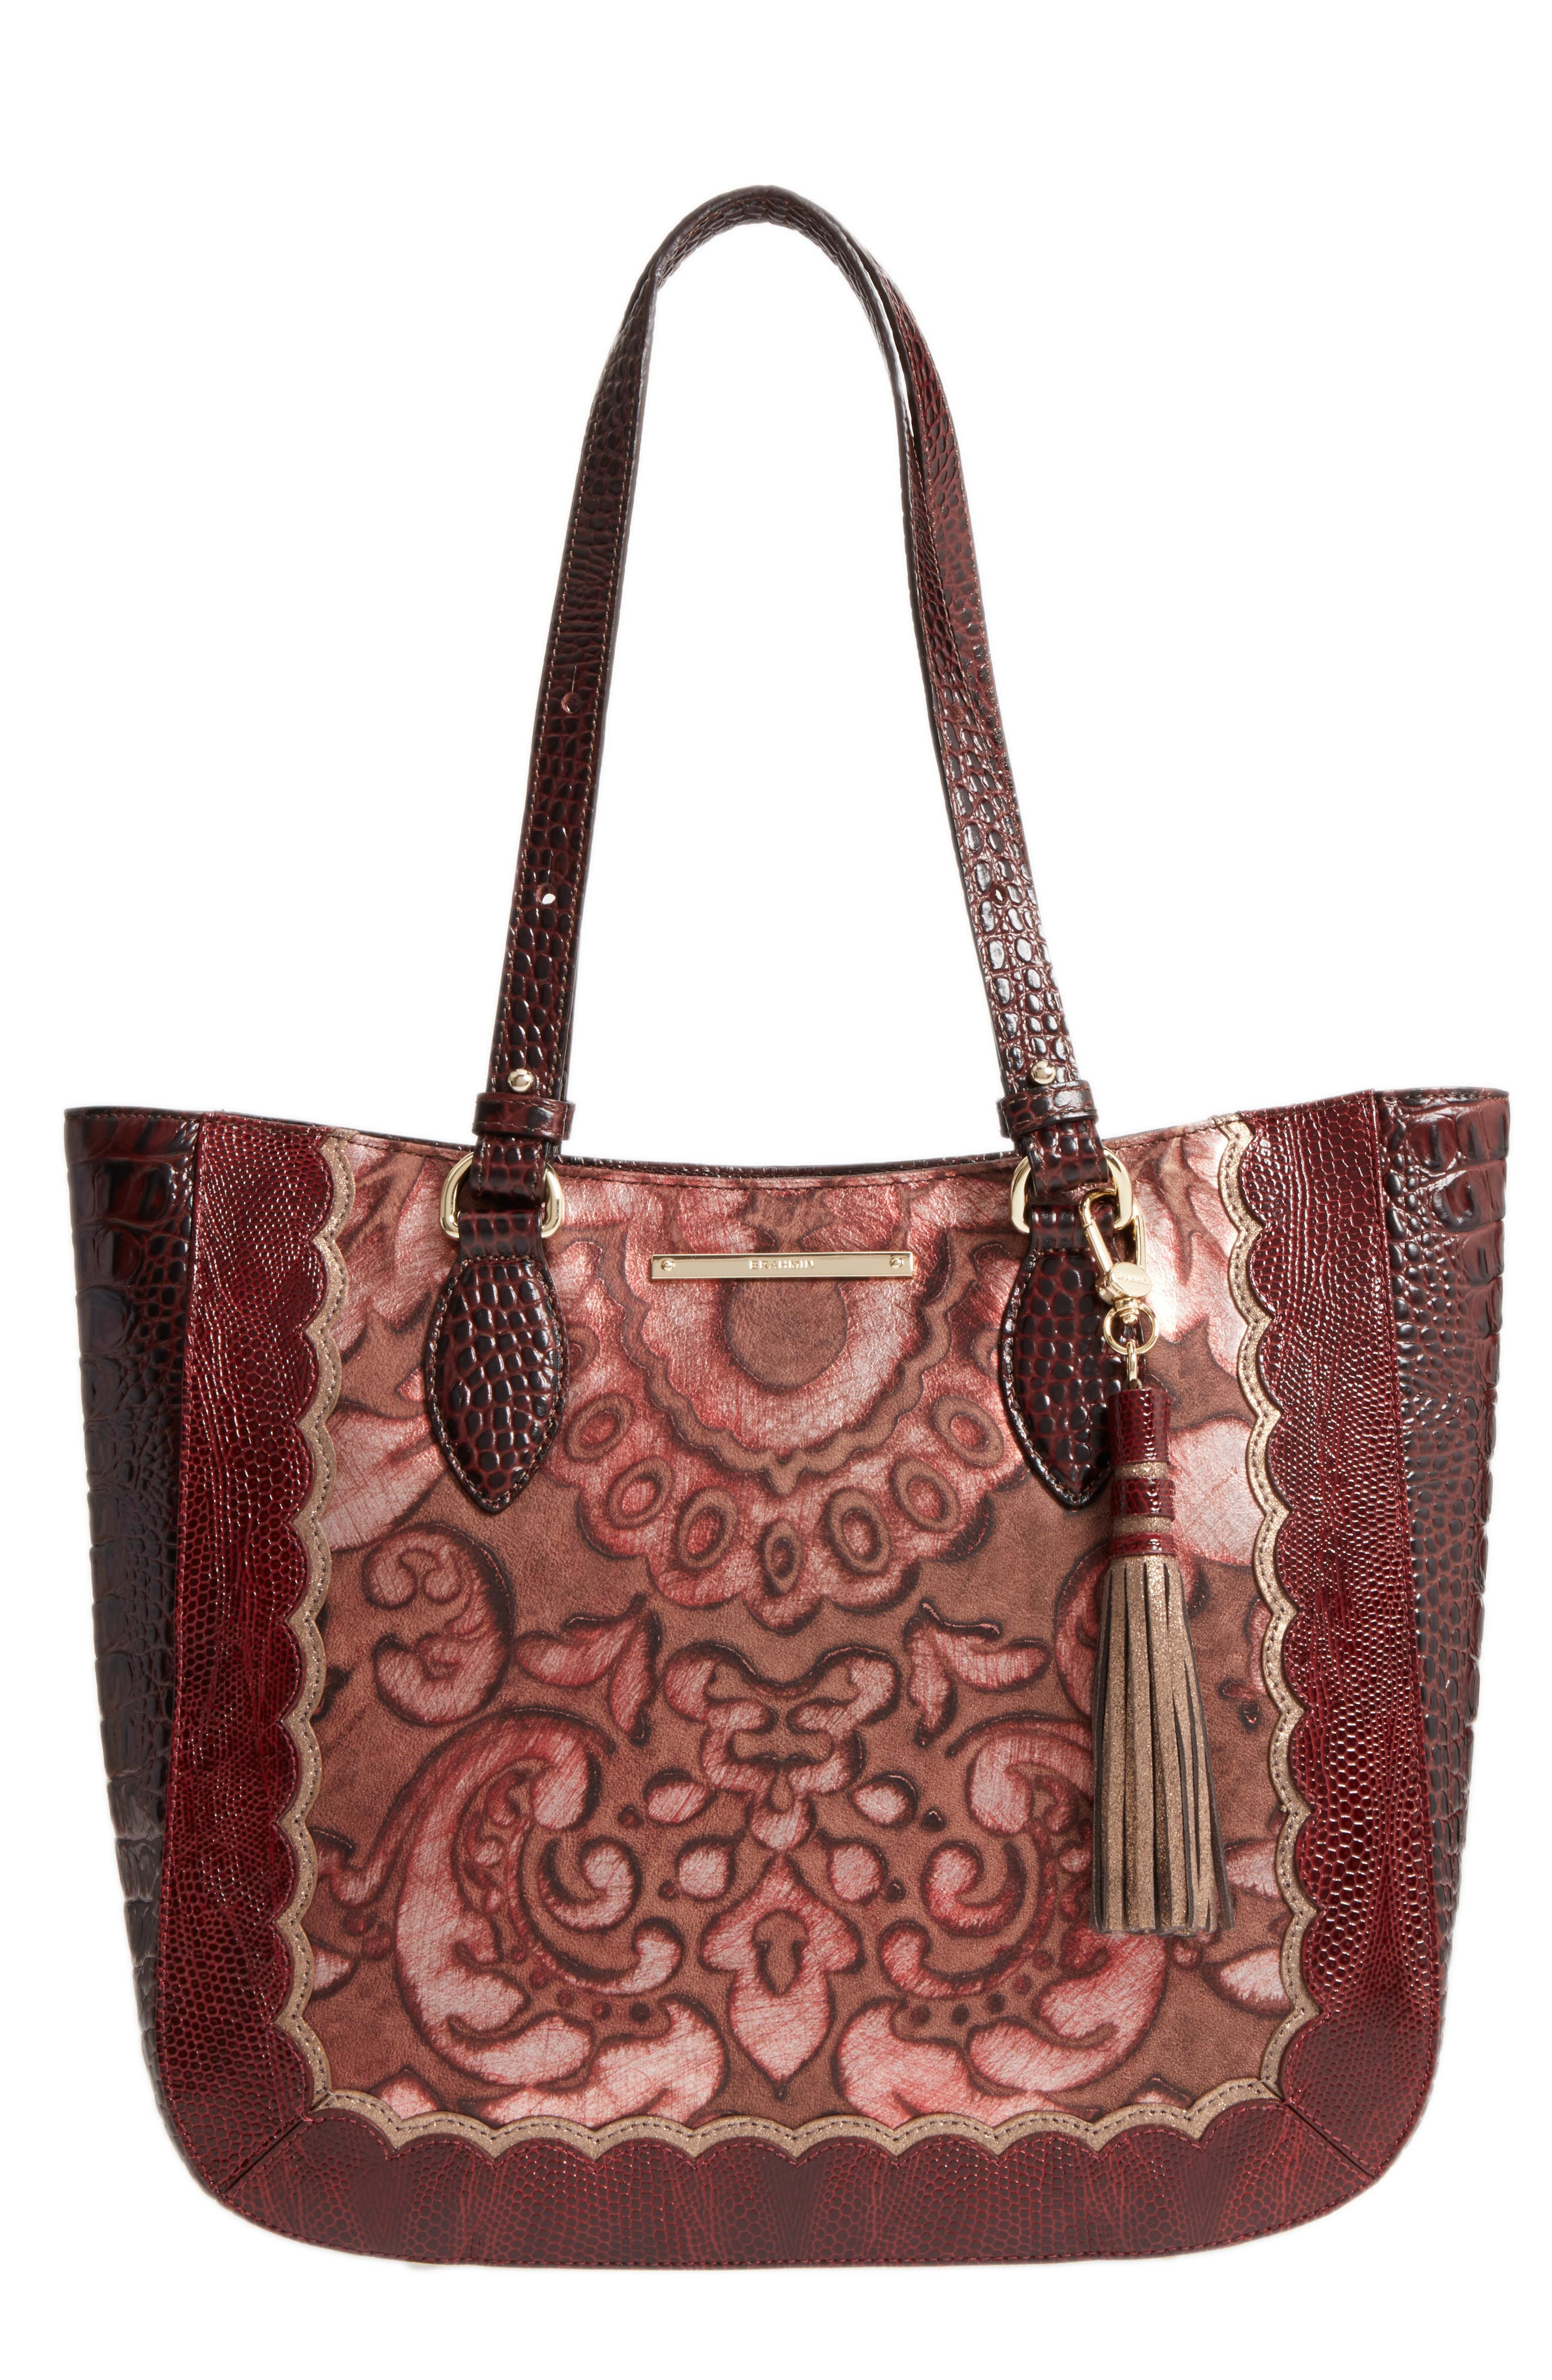 Medium Red Verona - Lena Leather Tote,                         Main,                         color, 610